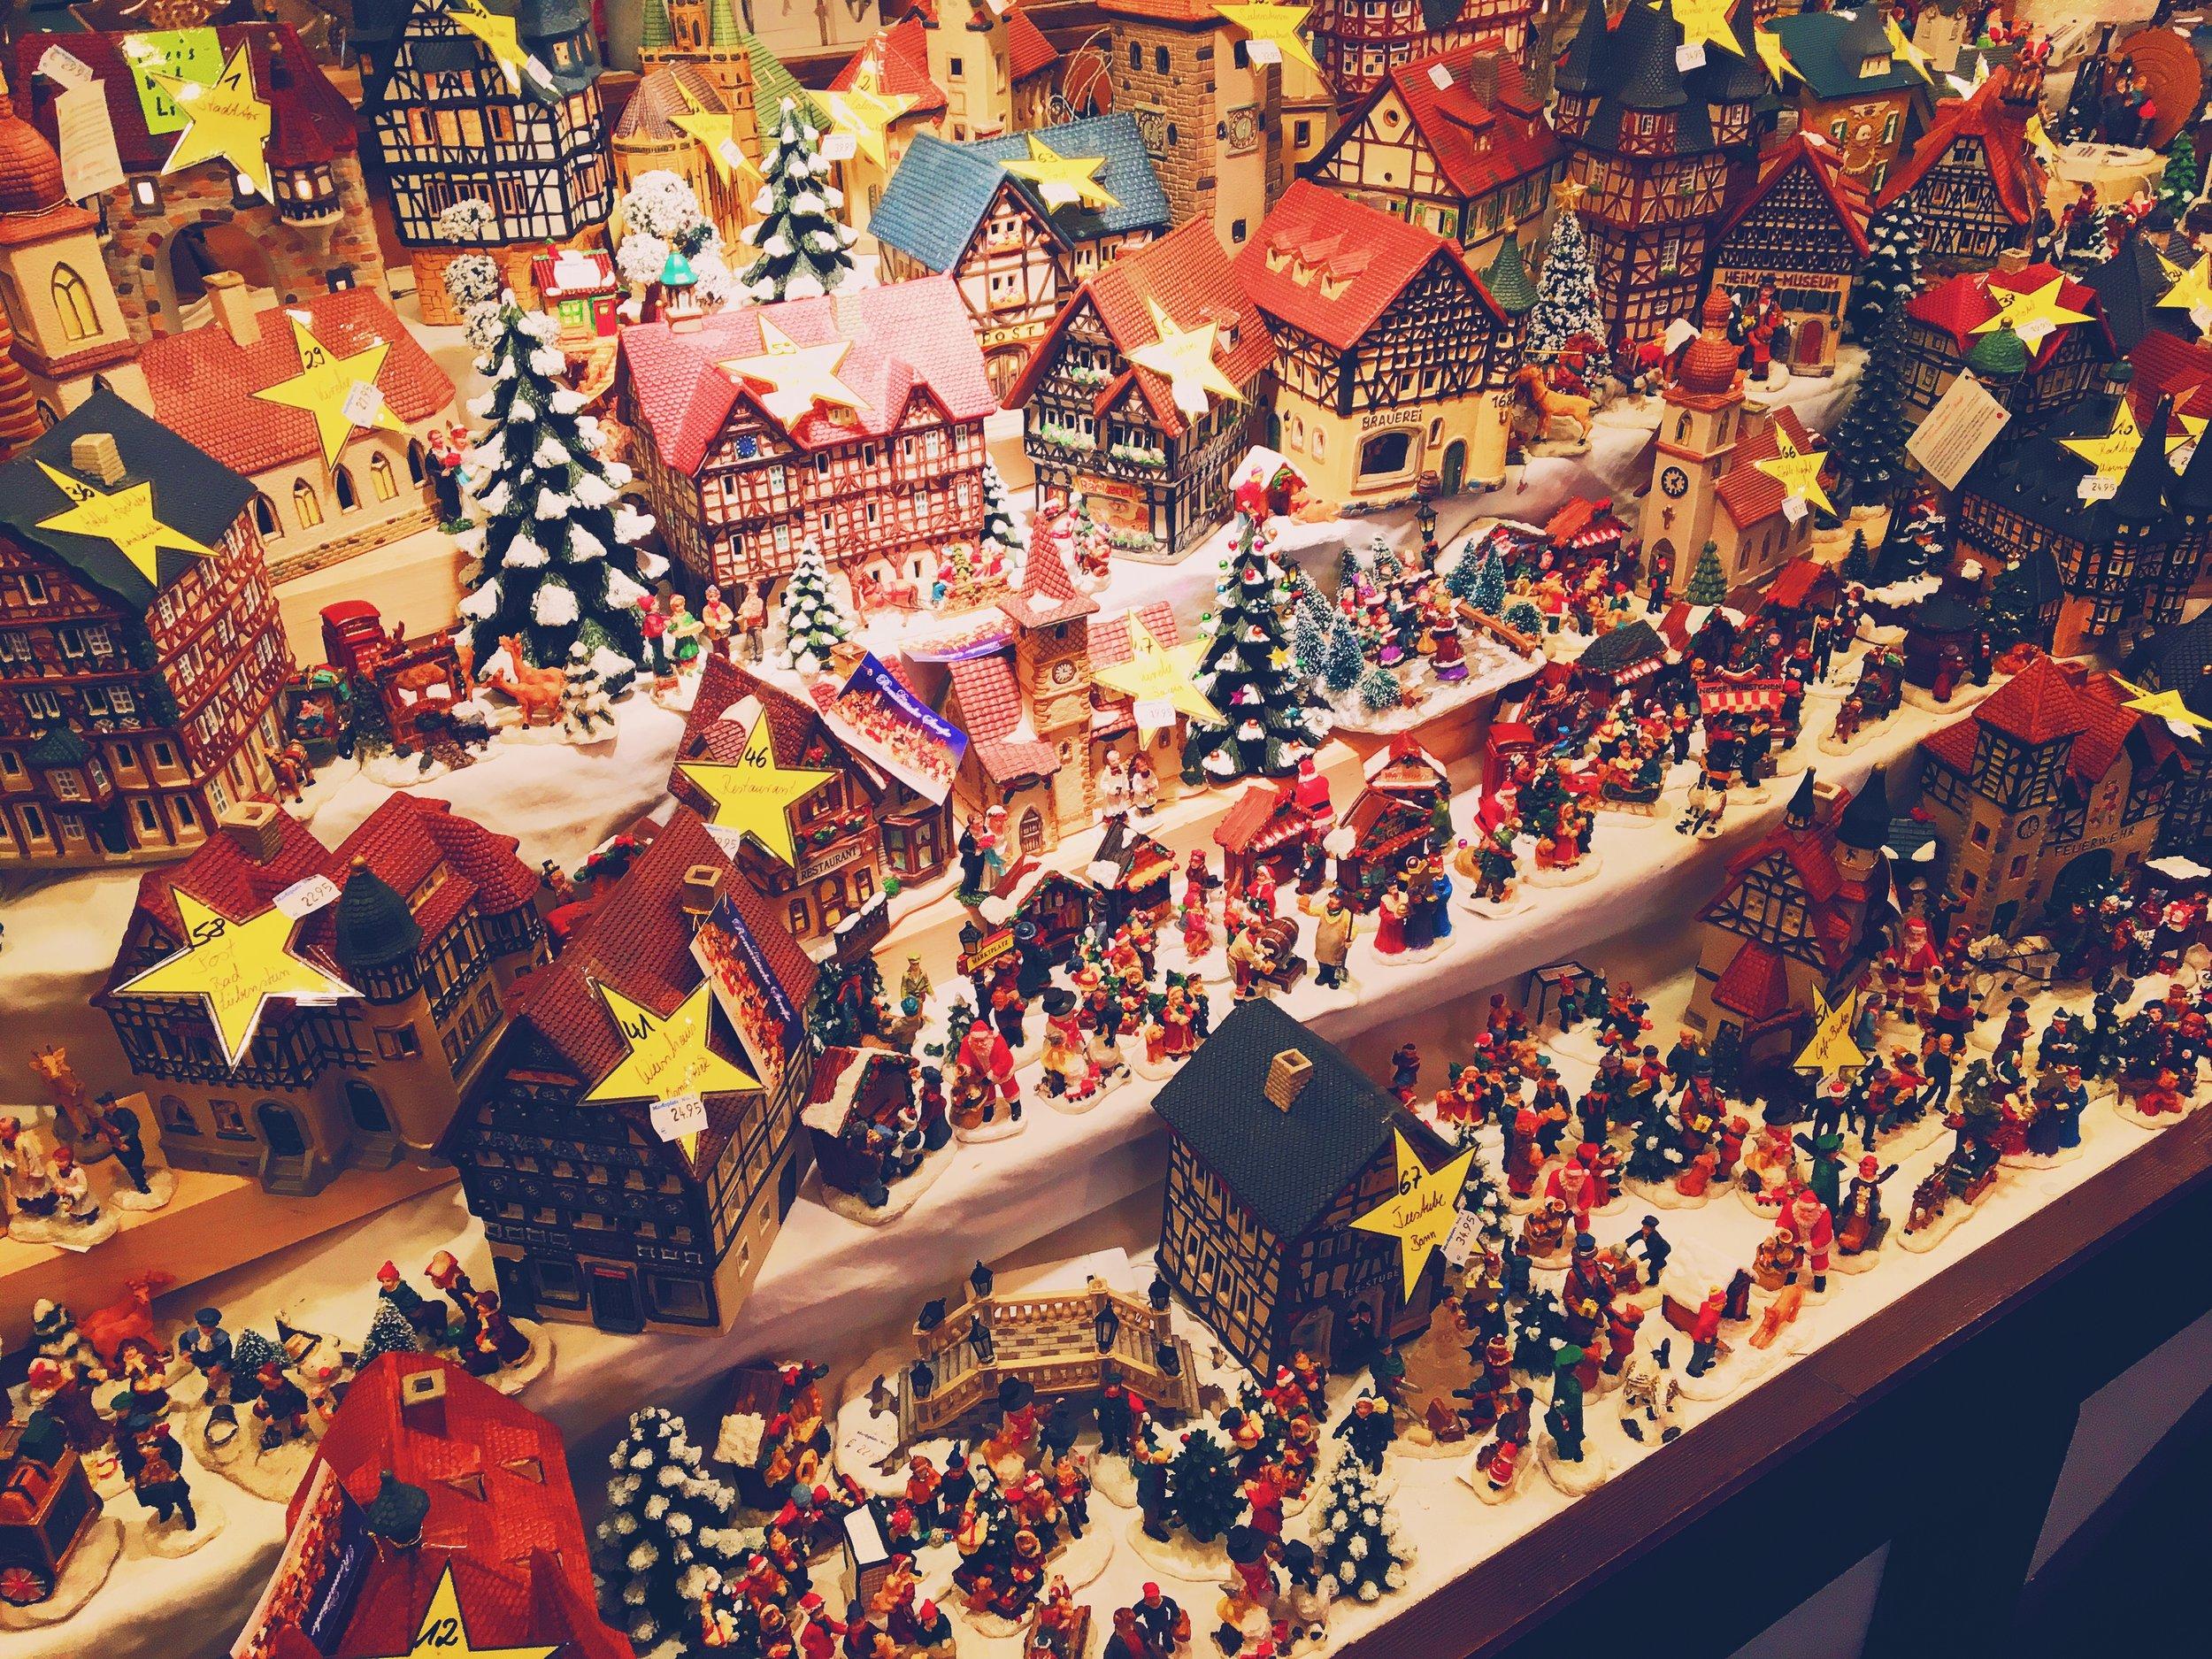 Chrismas market1.JPG